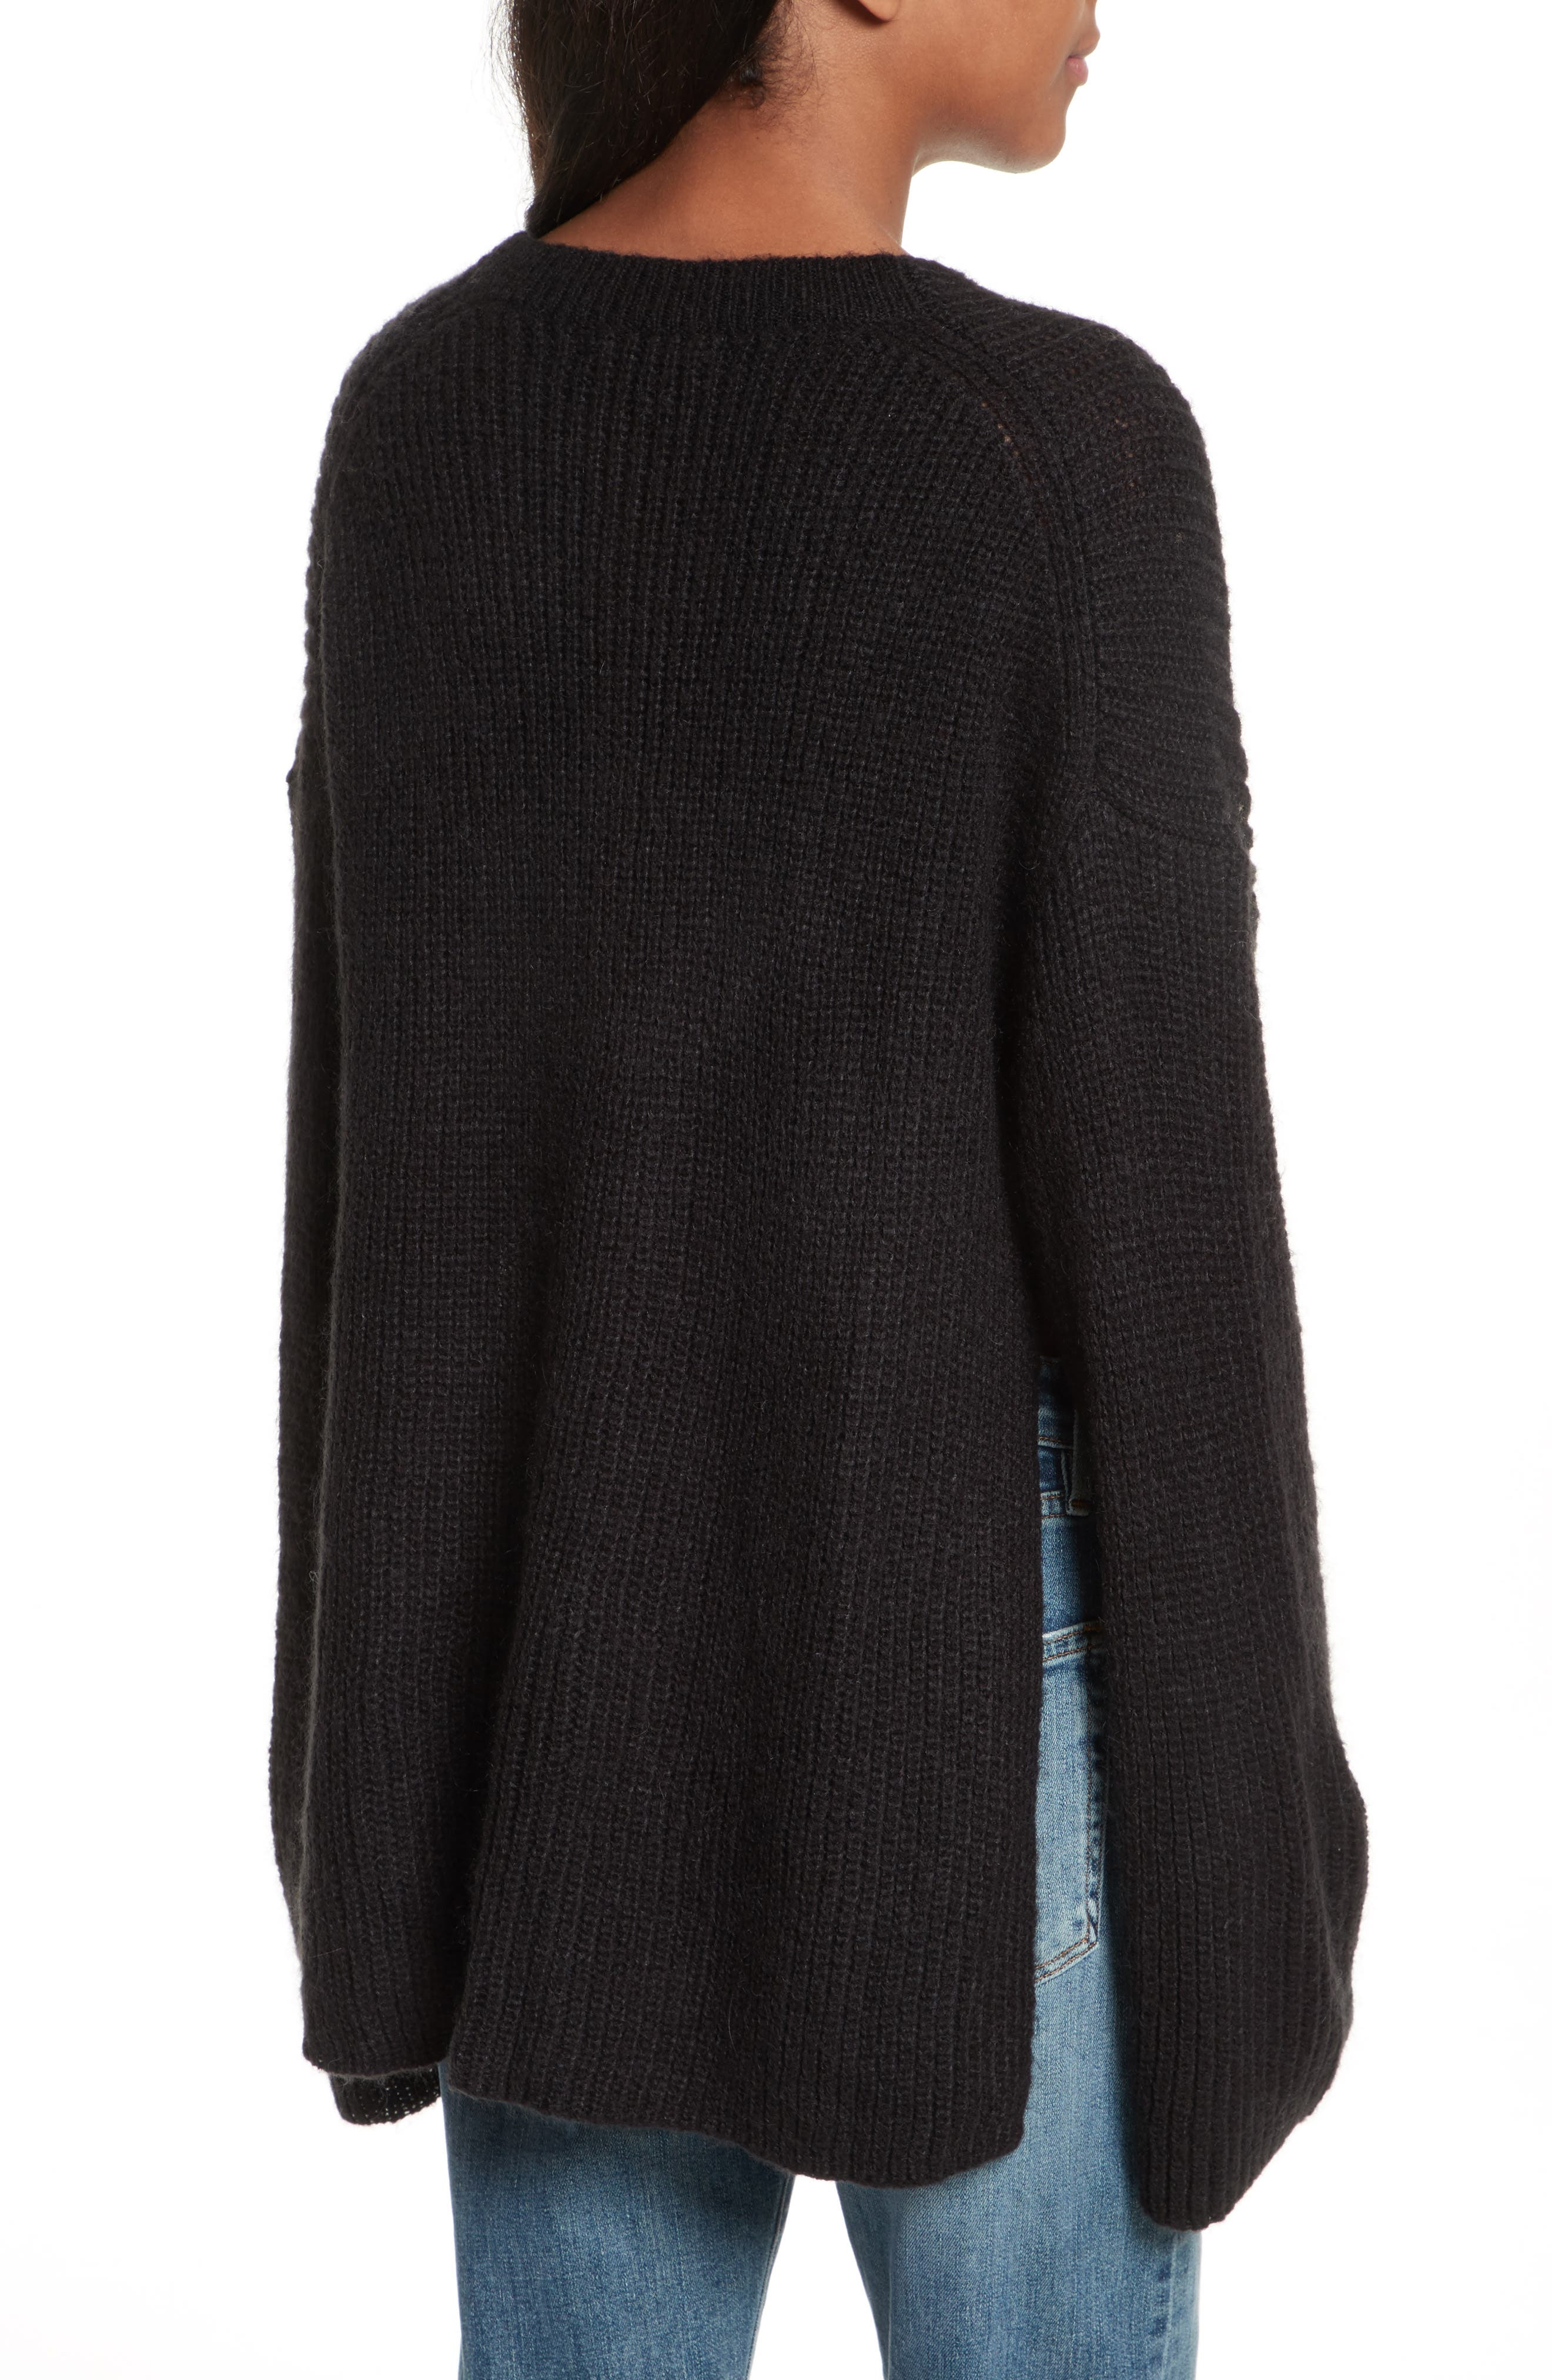 Remi Oversize Sweater,                             Alternate thumbnail 2, color,                             001